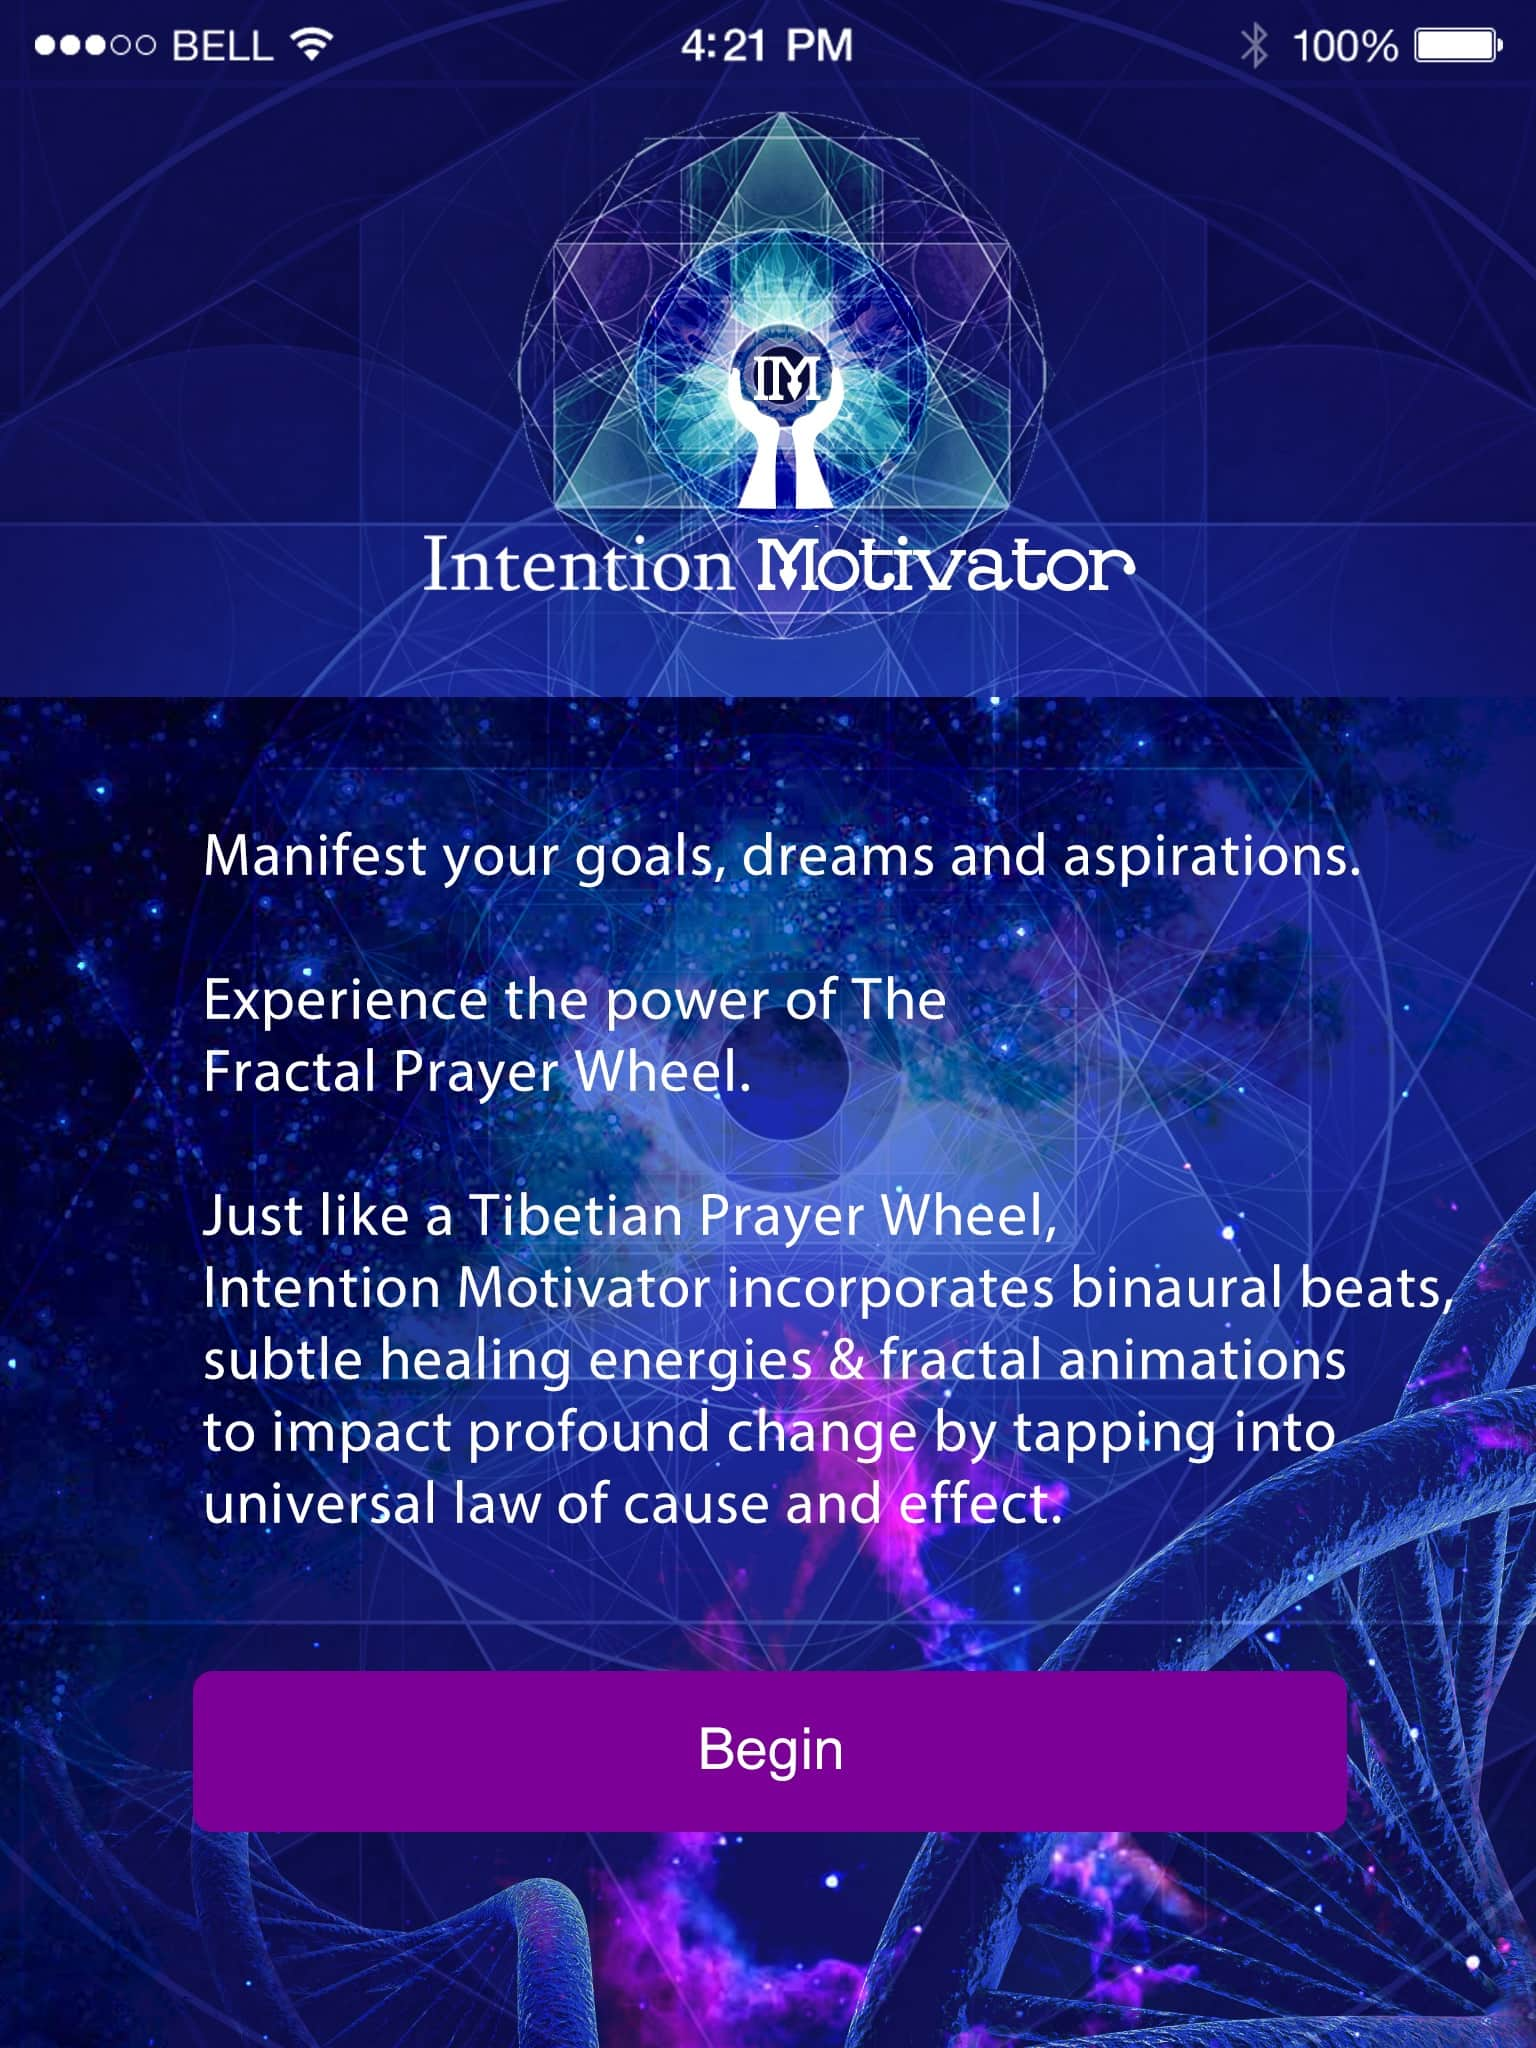 Intention Motivator